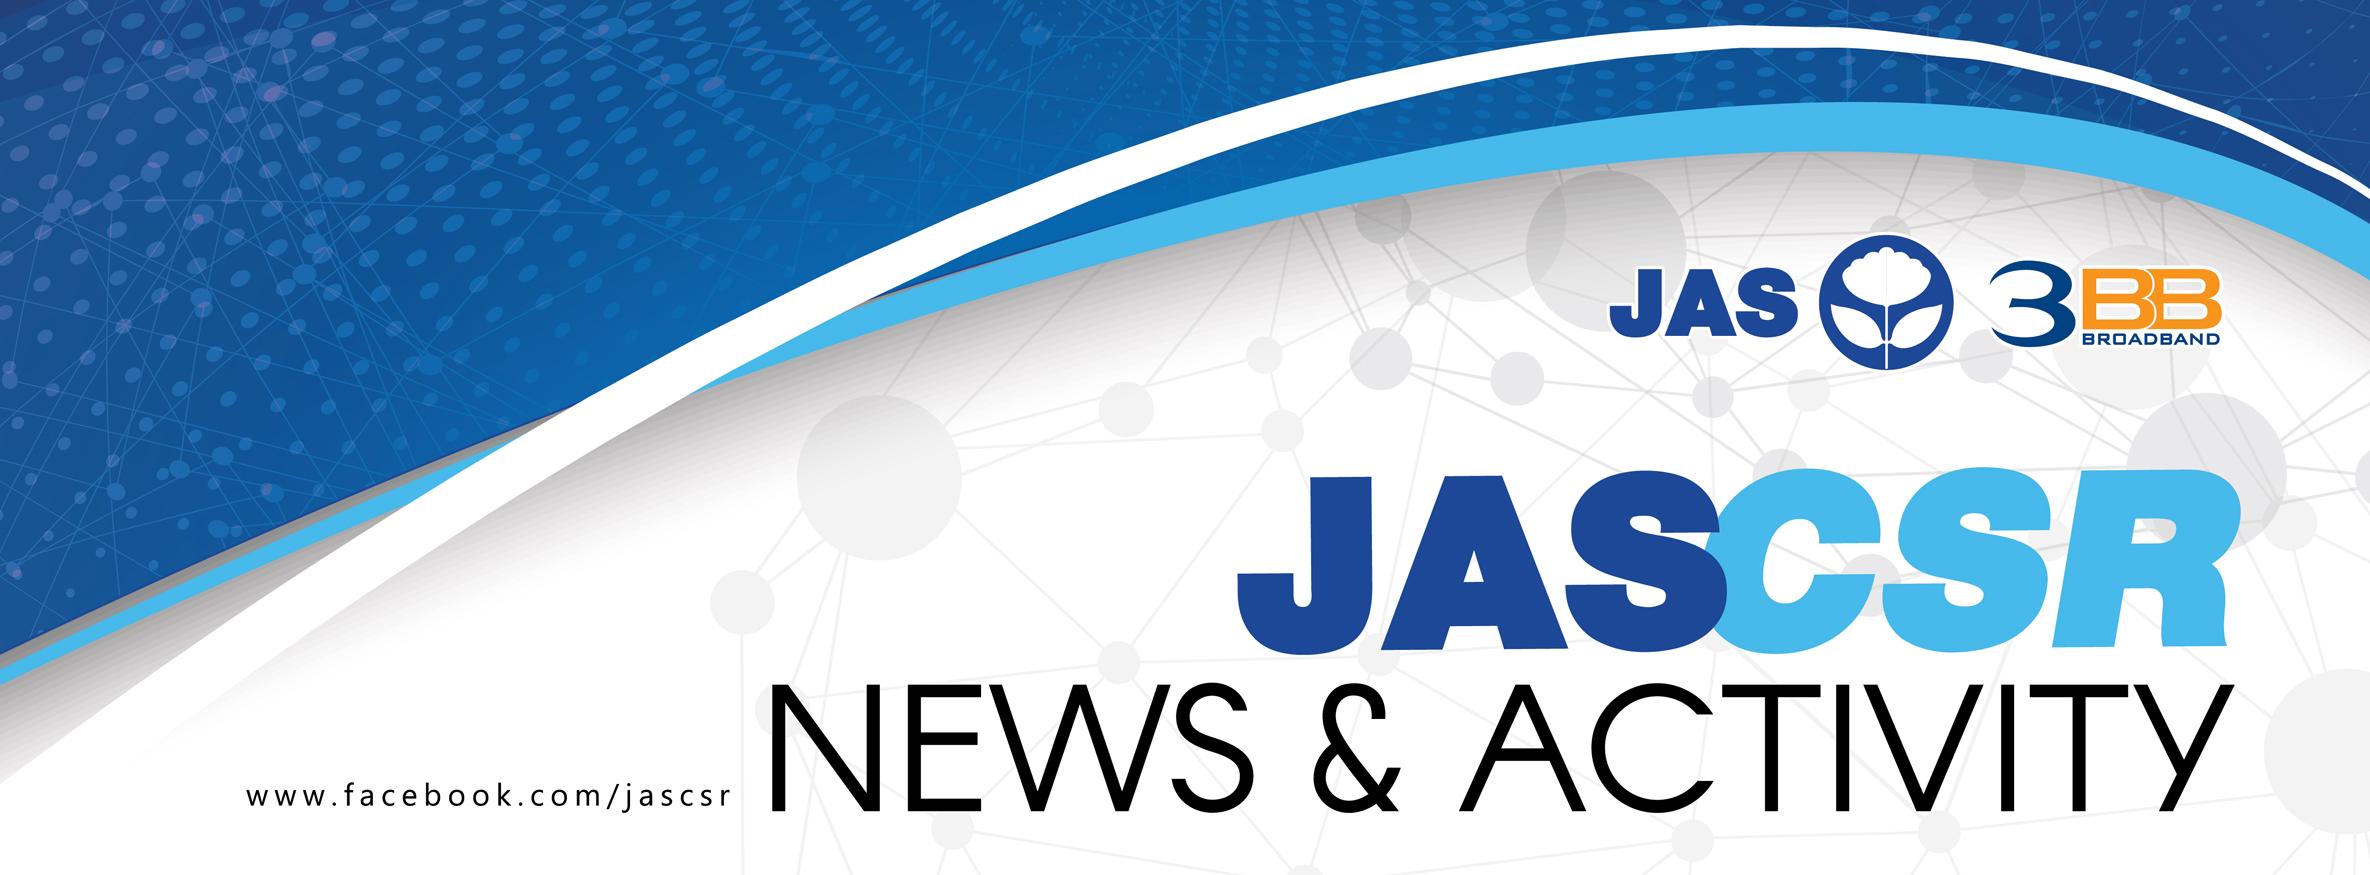 Jas CSR News & Activity